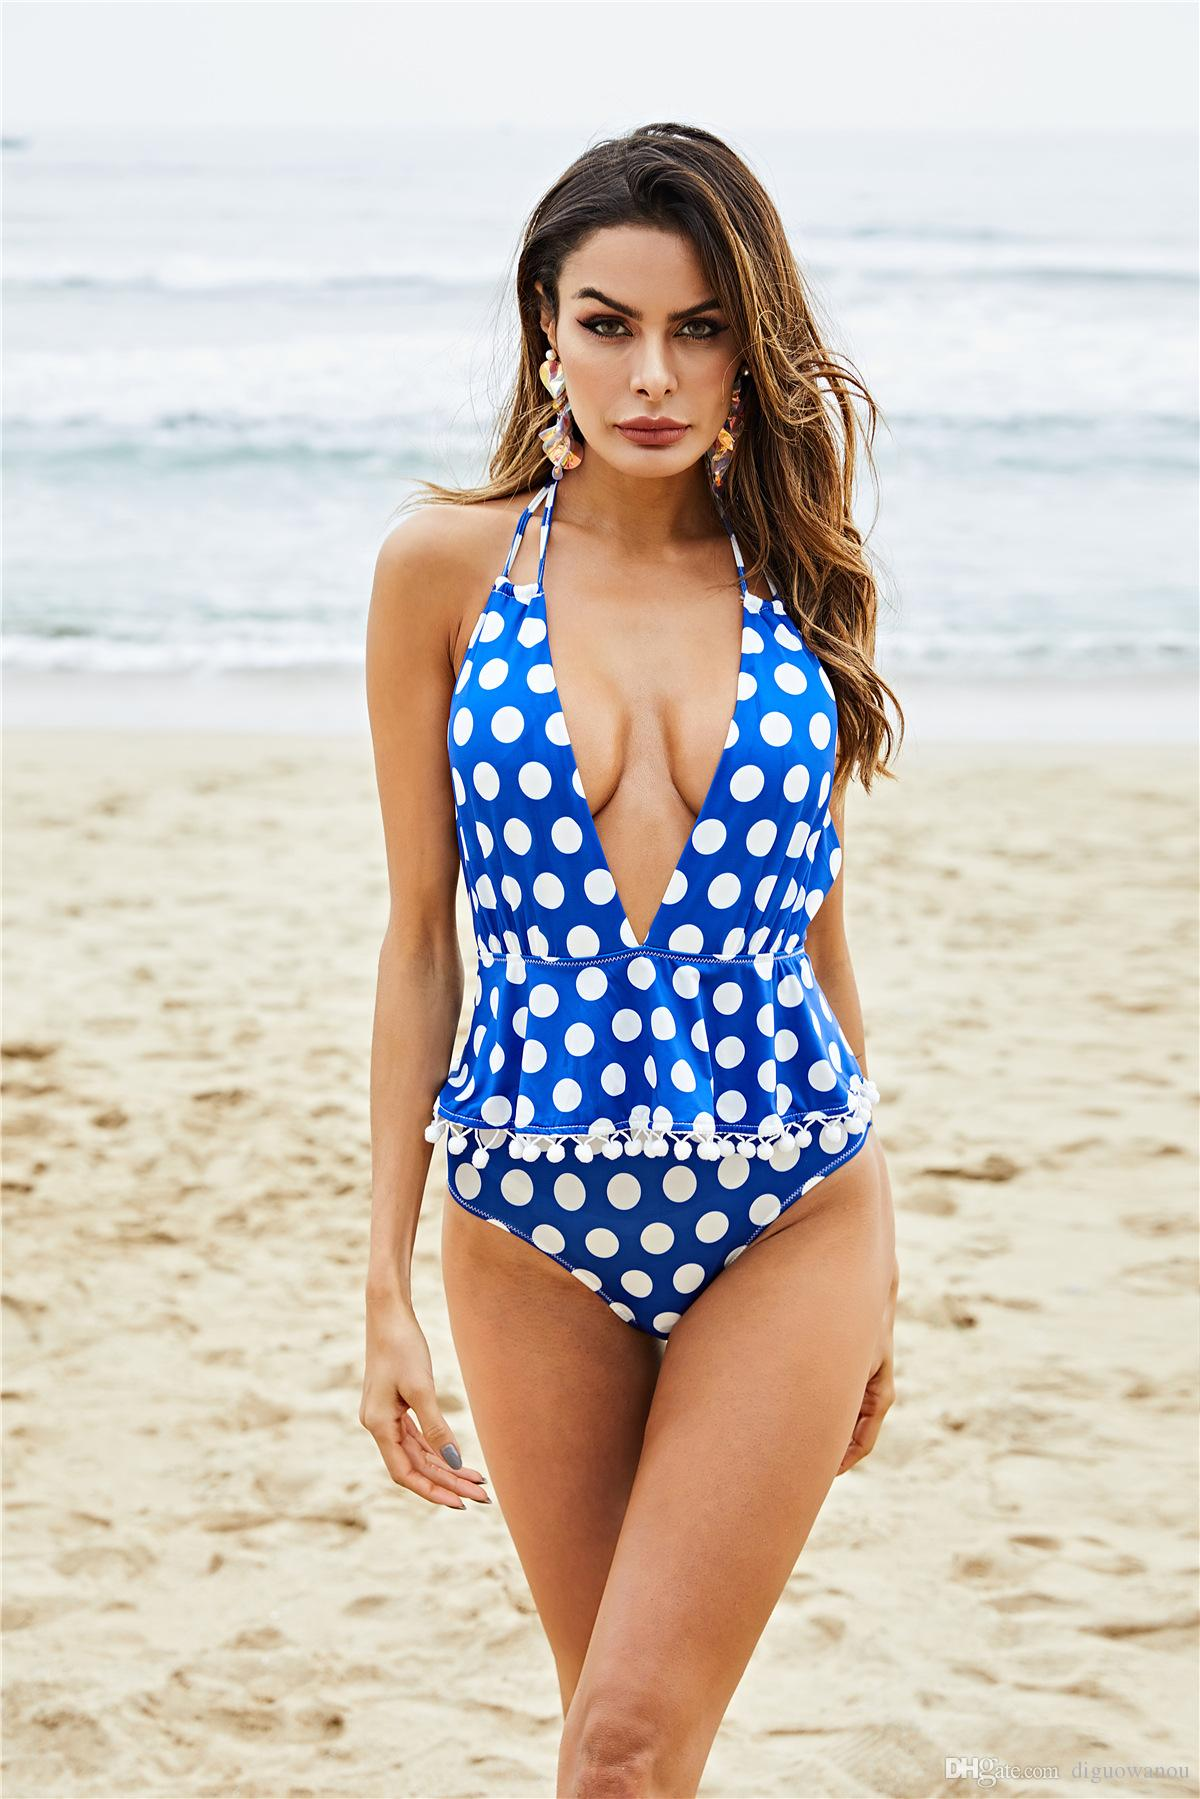 Avengers 4 Endgame Women Swimwear Bikini Backless One Piece Swimsuit BathingSuit